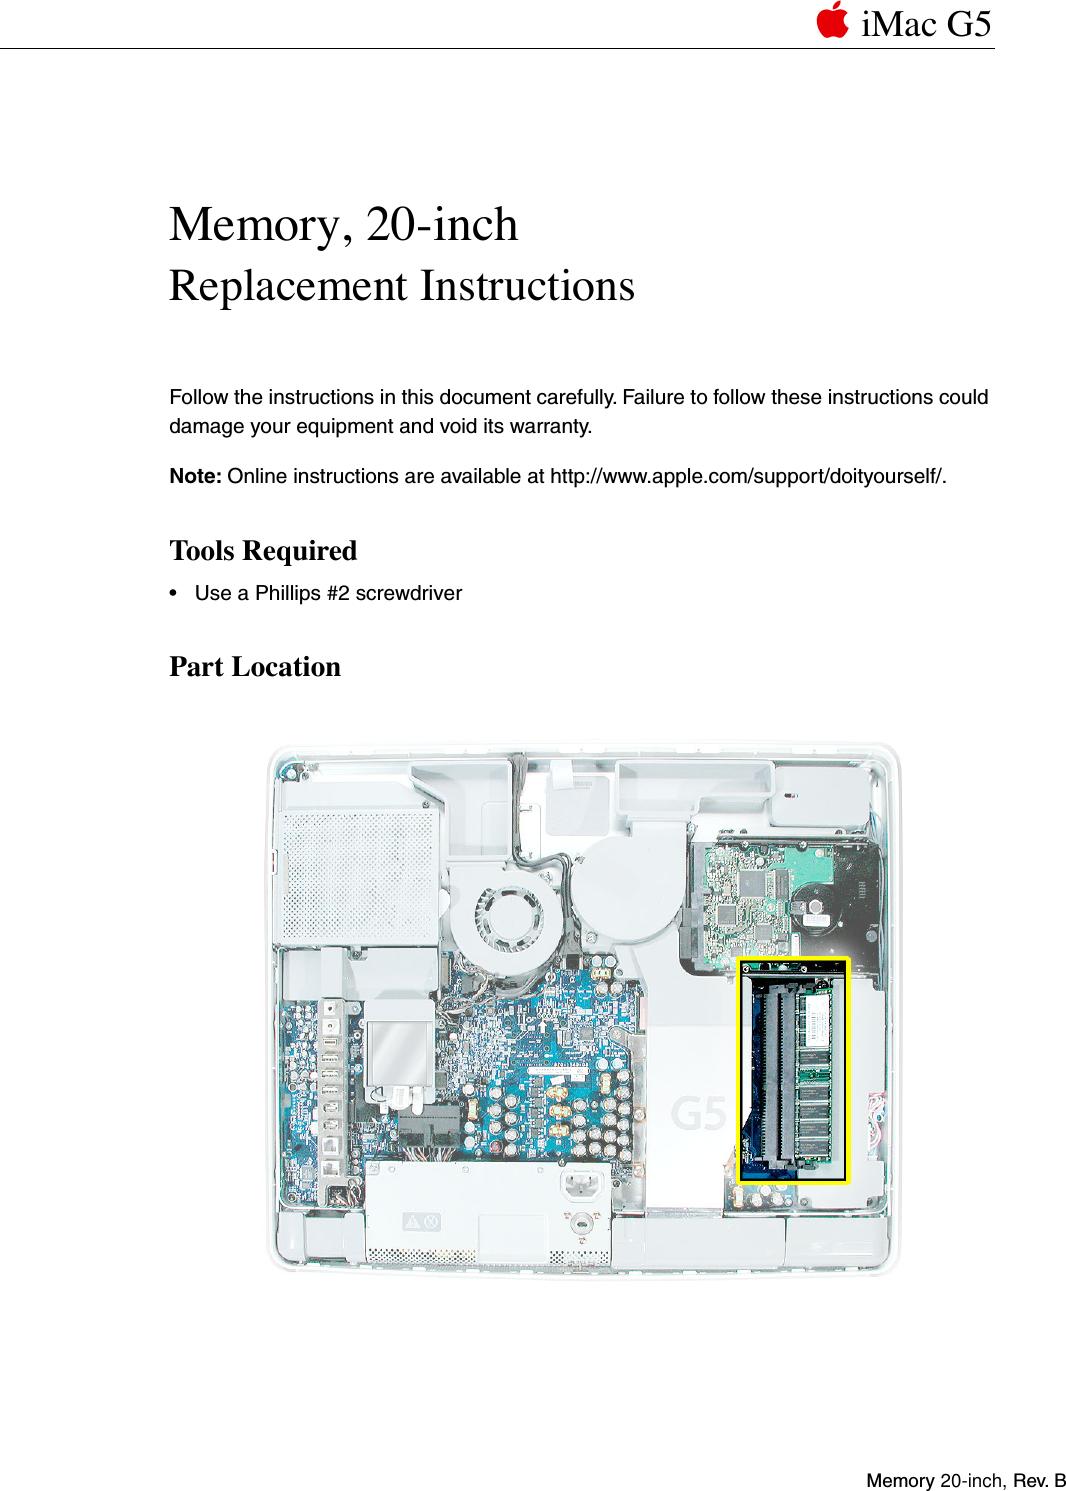 Wiring Diagram For Apple Magsafe : Magsafe wiring diagram glock